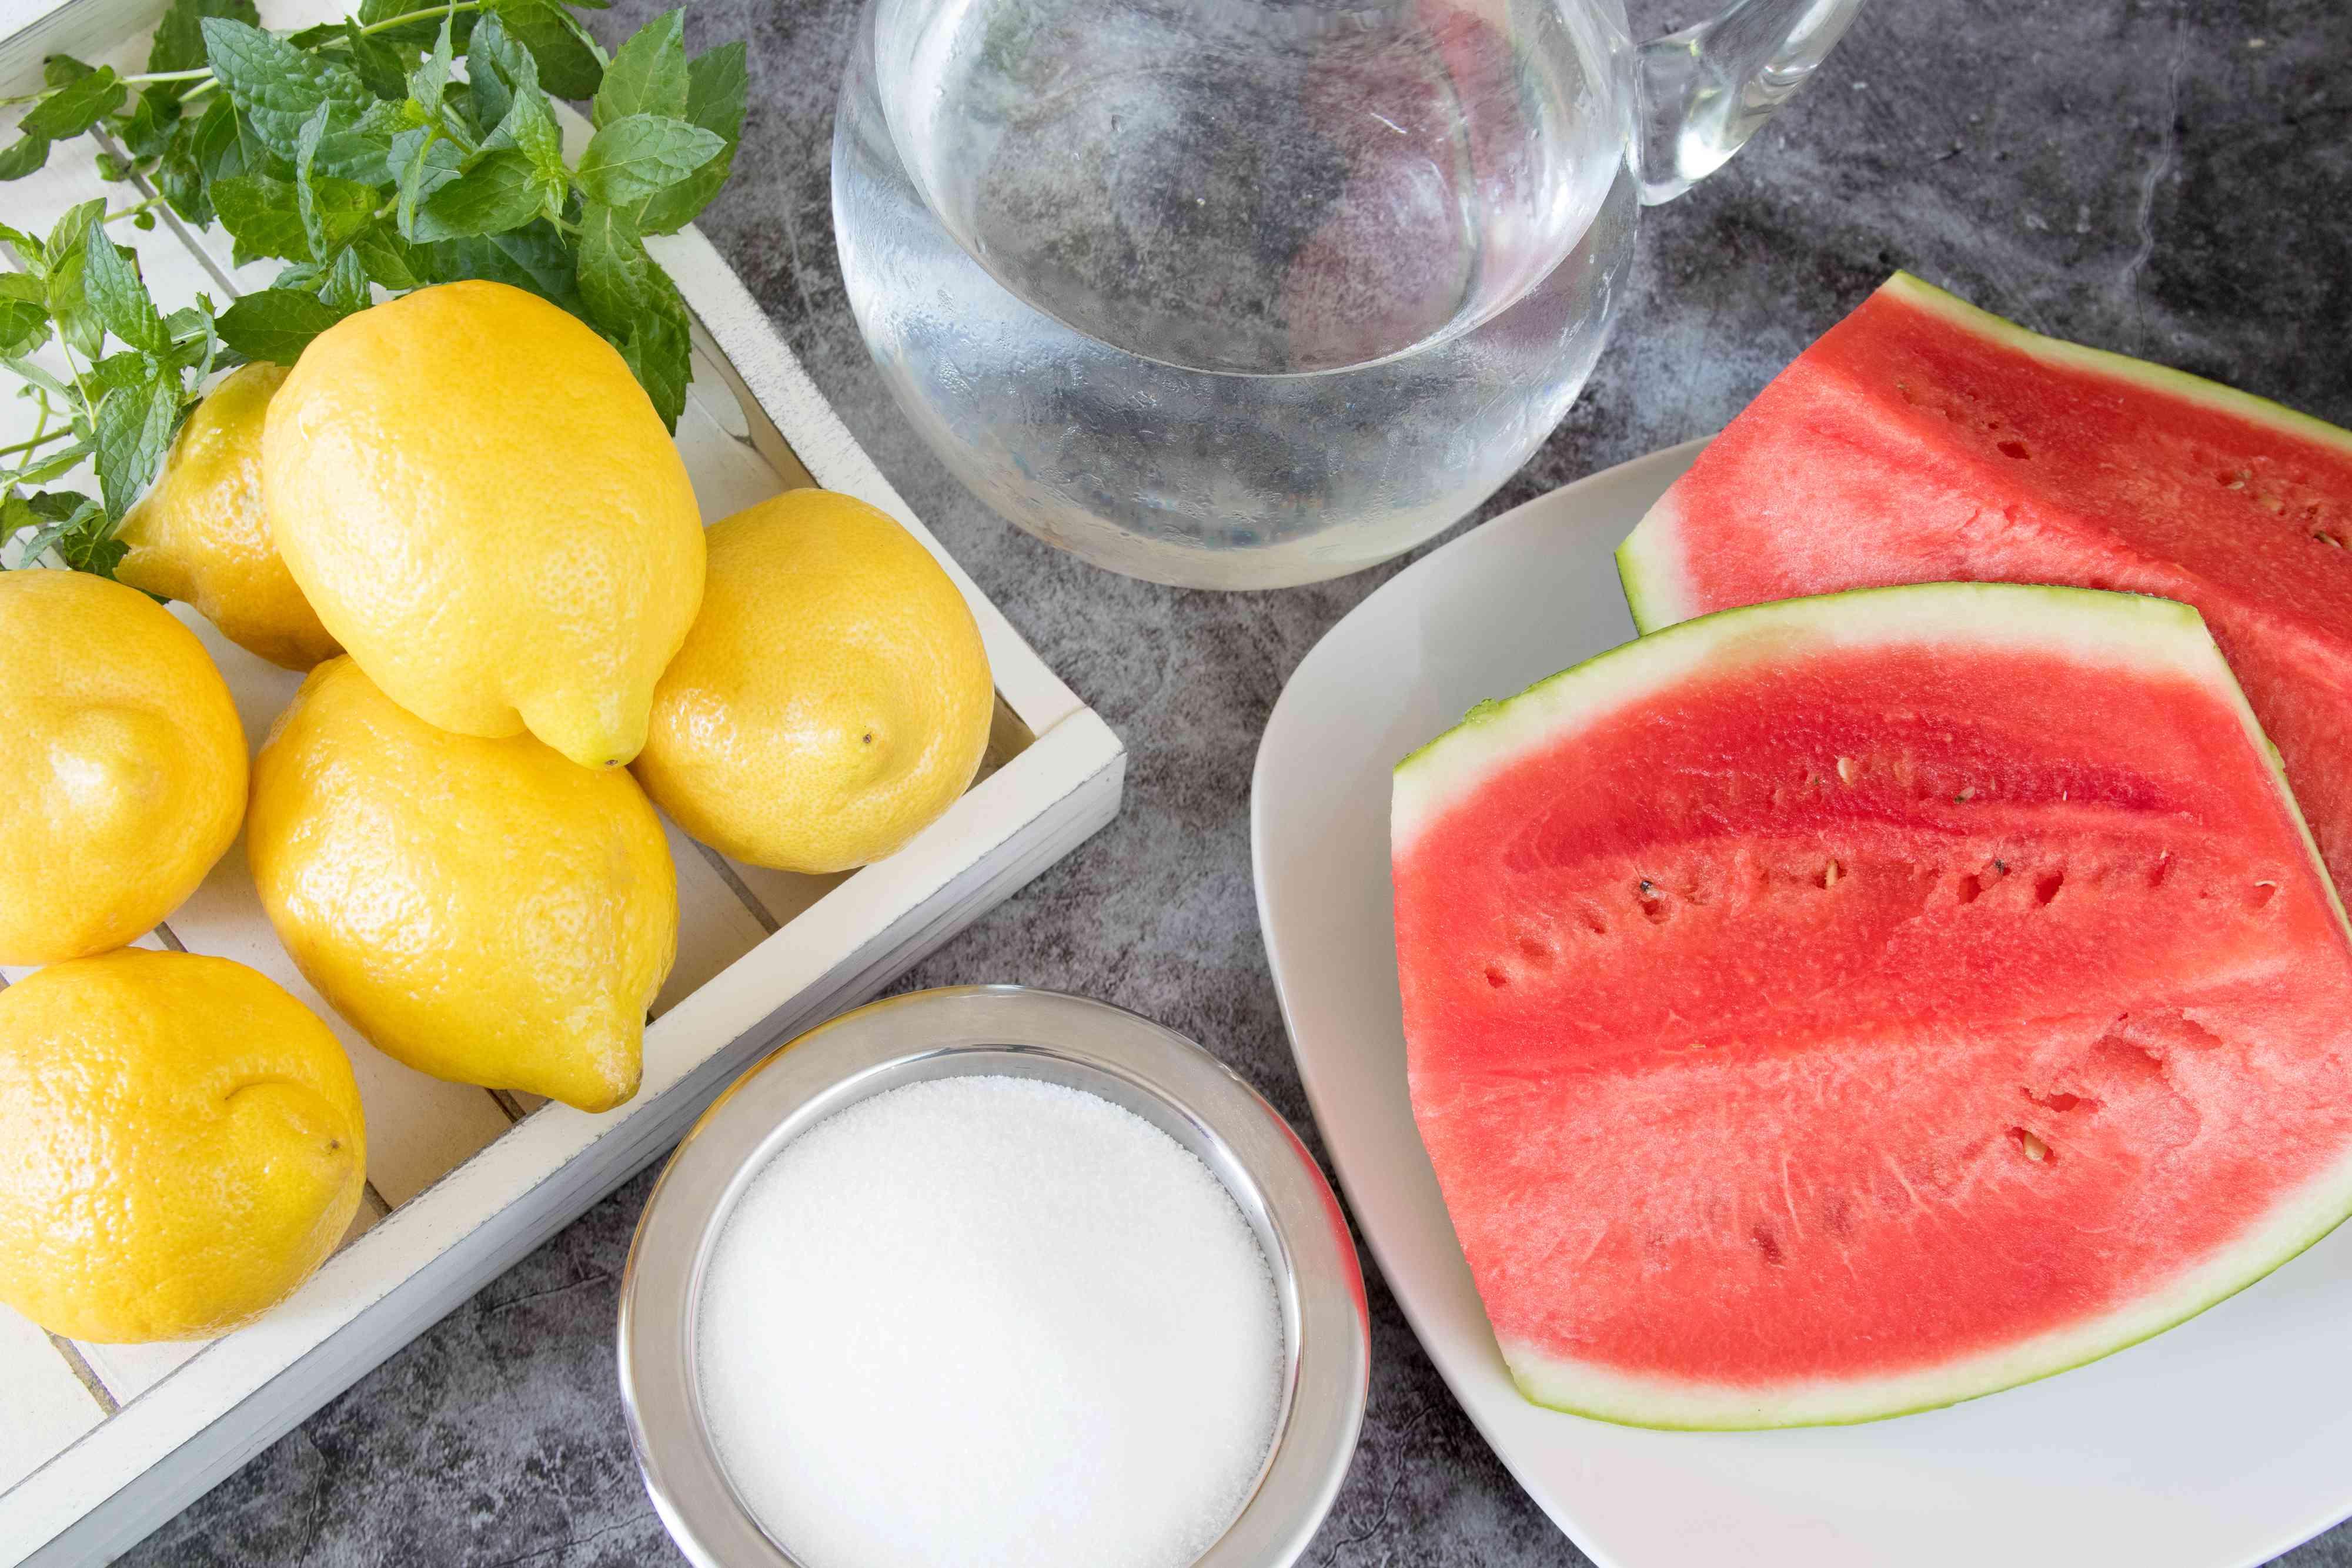 Ingredients for Fresh Watermelon Lemonade